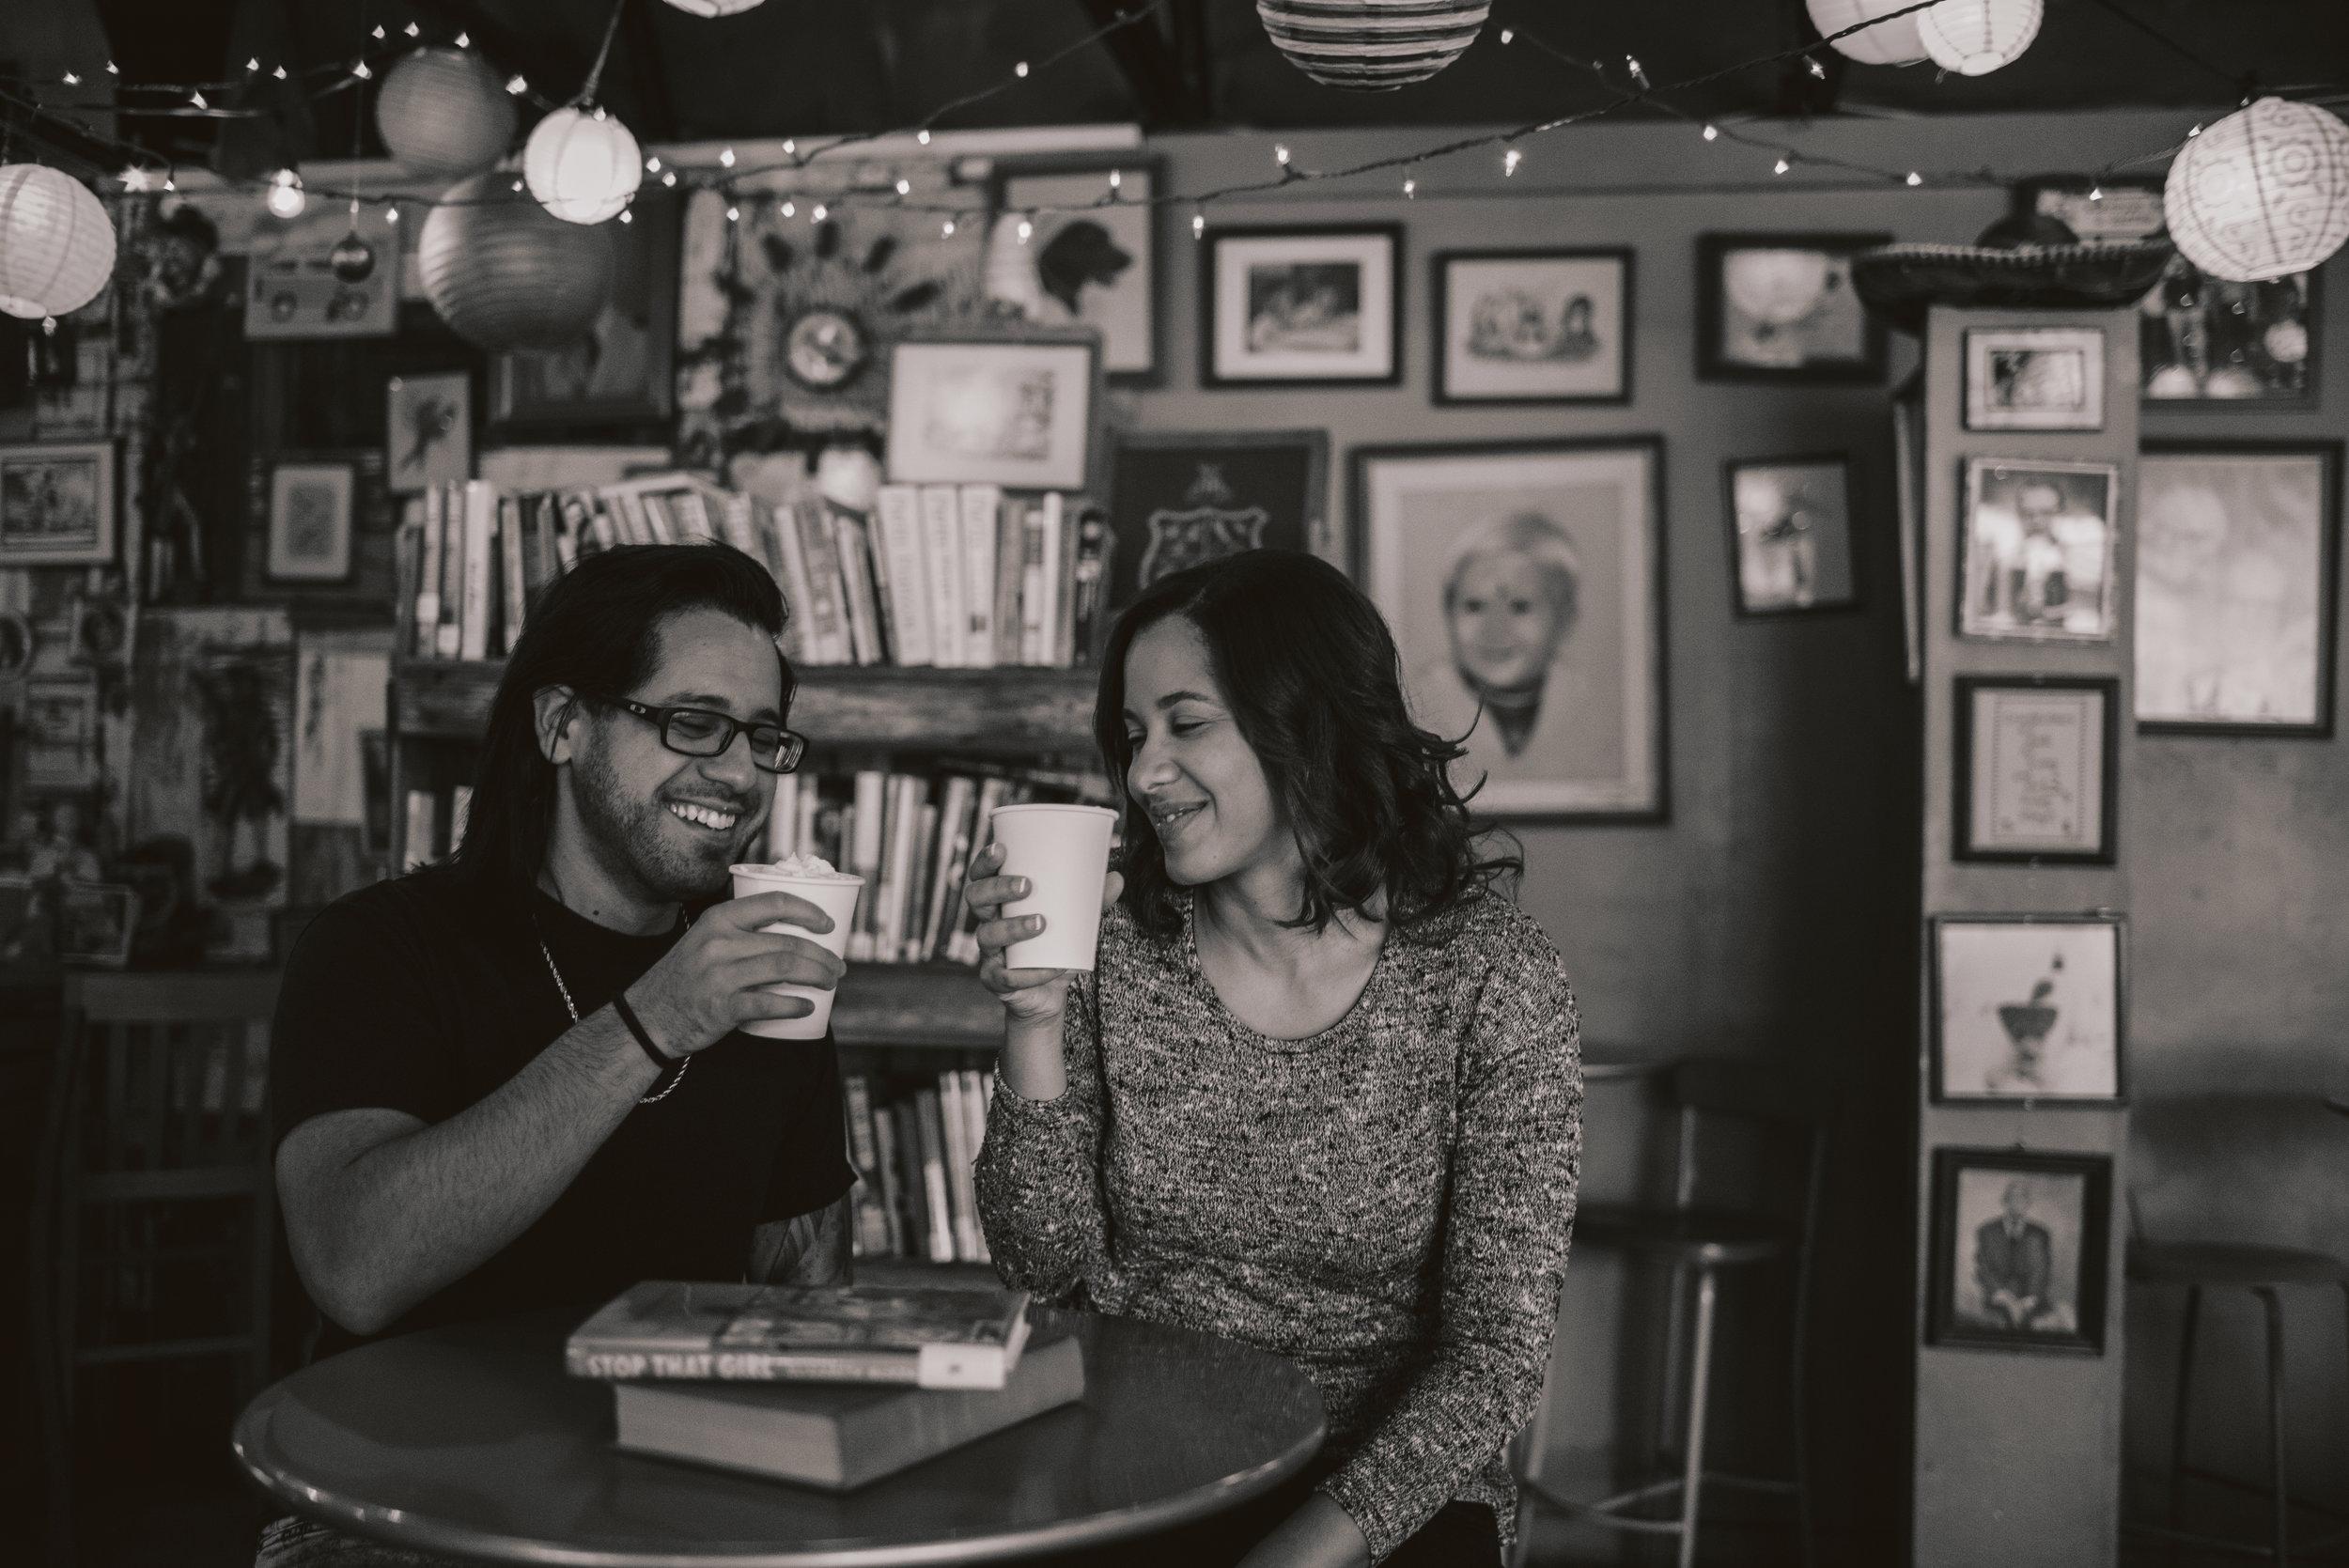 Los-Vargas-Photo-Central-Florida-Engagement-Coffee-Shop-Session-10.jpg